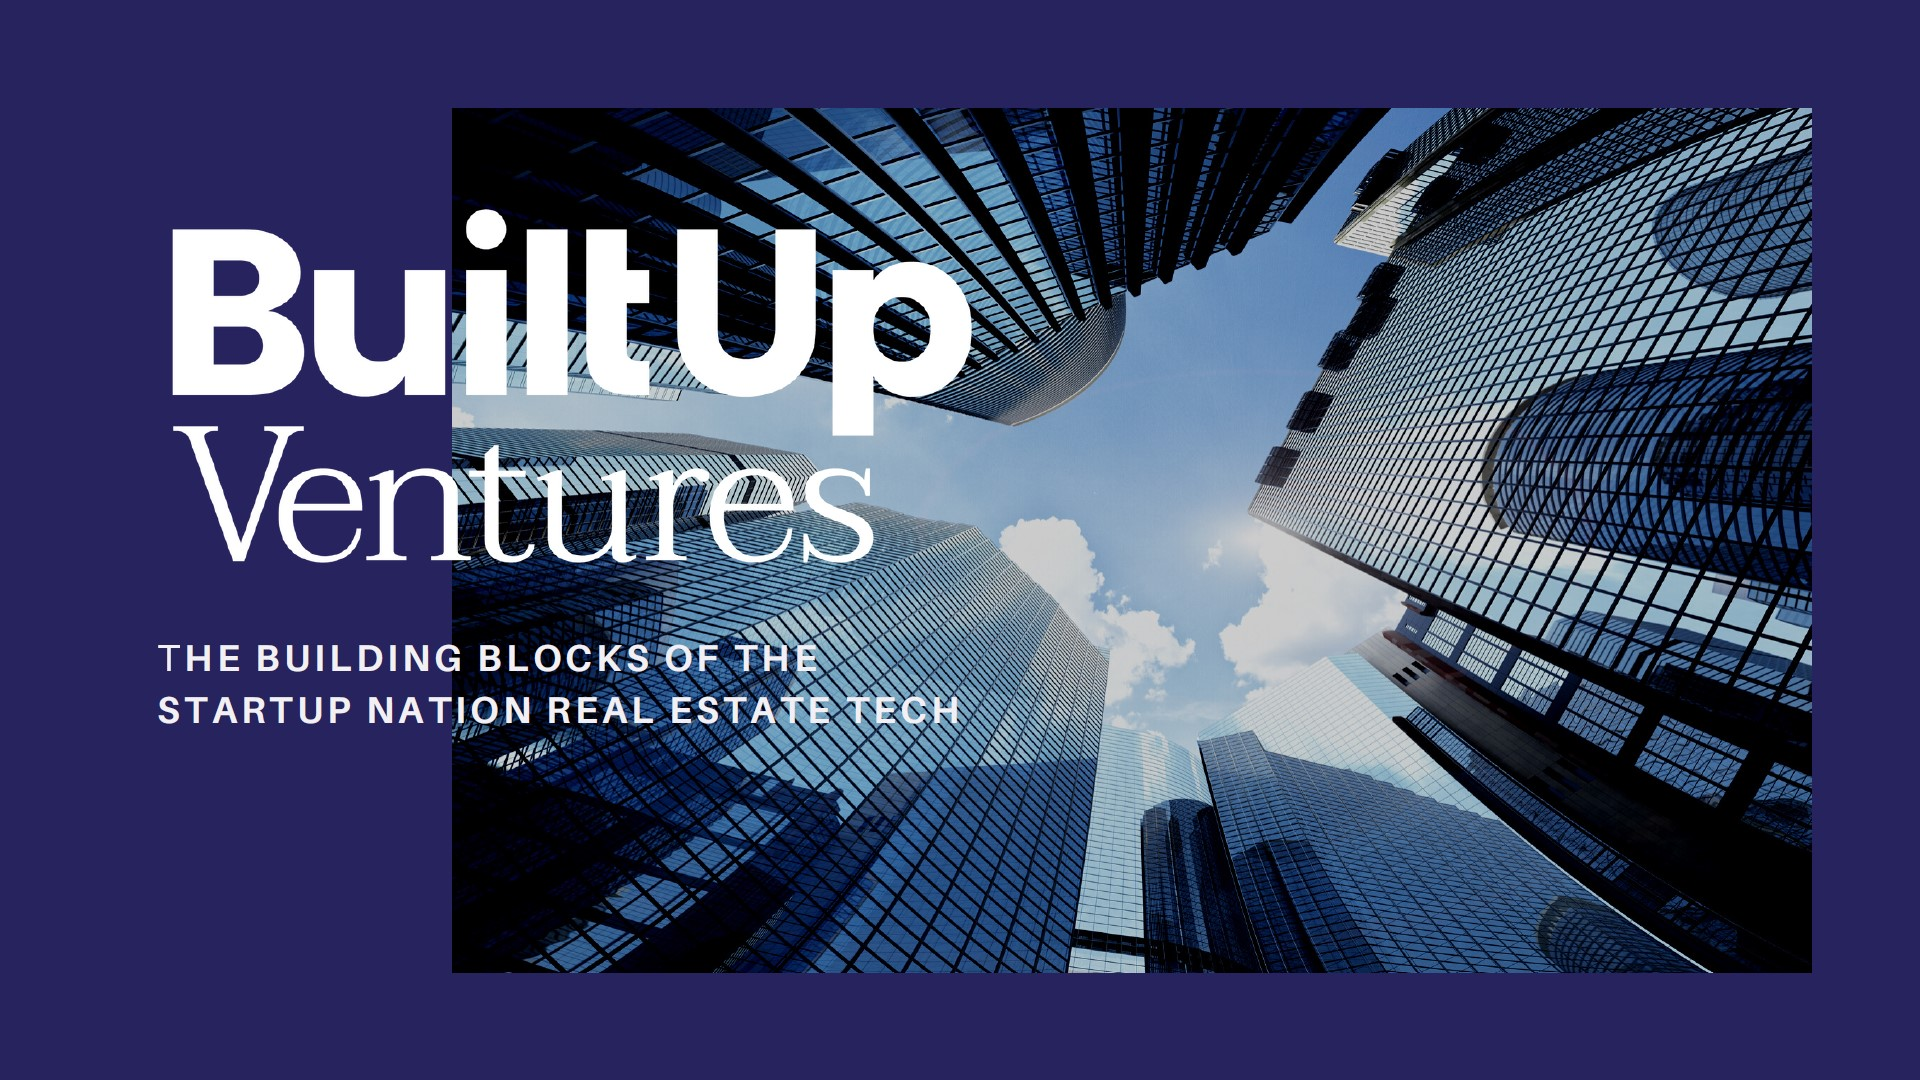 BuiltUp Ventures